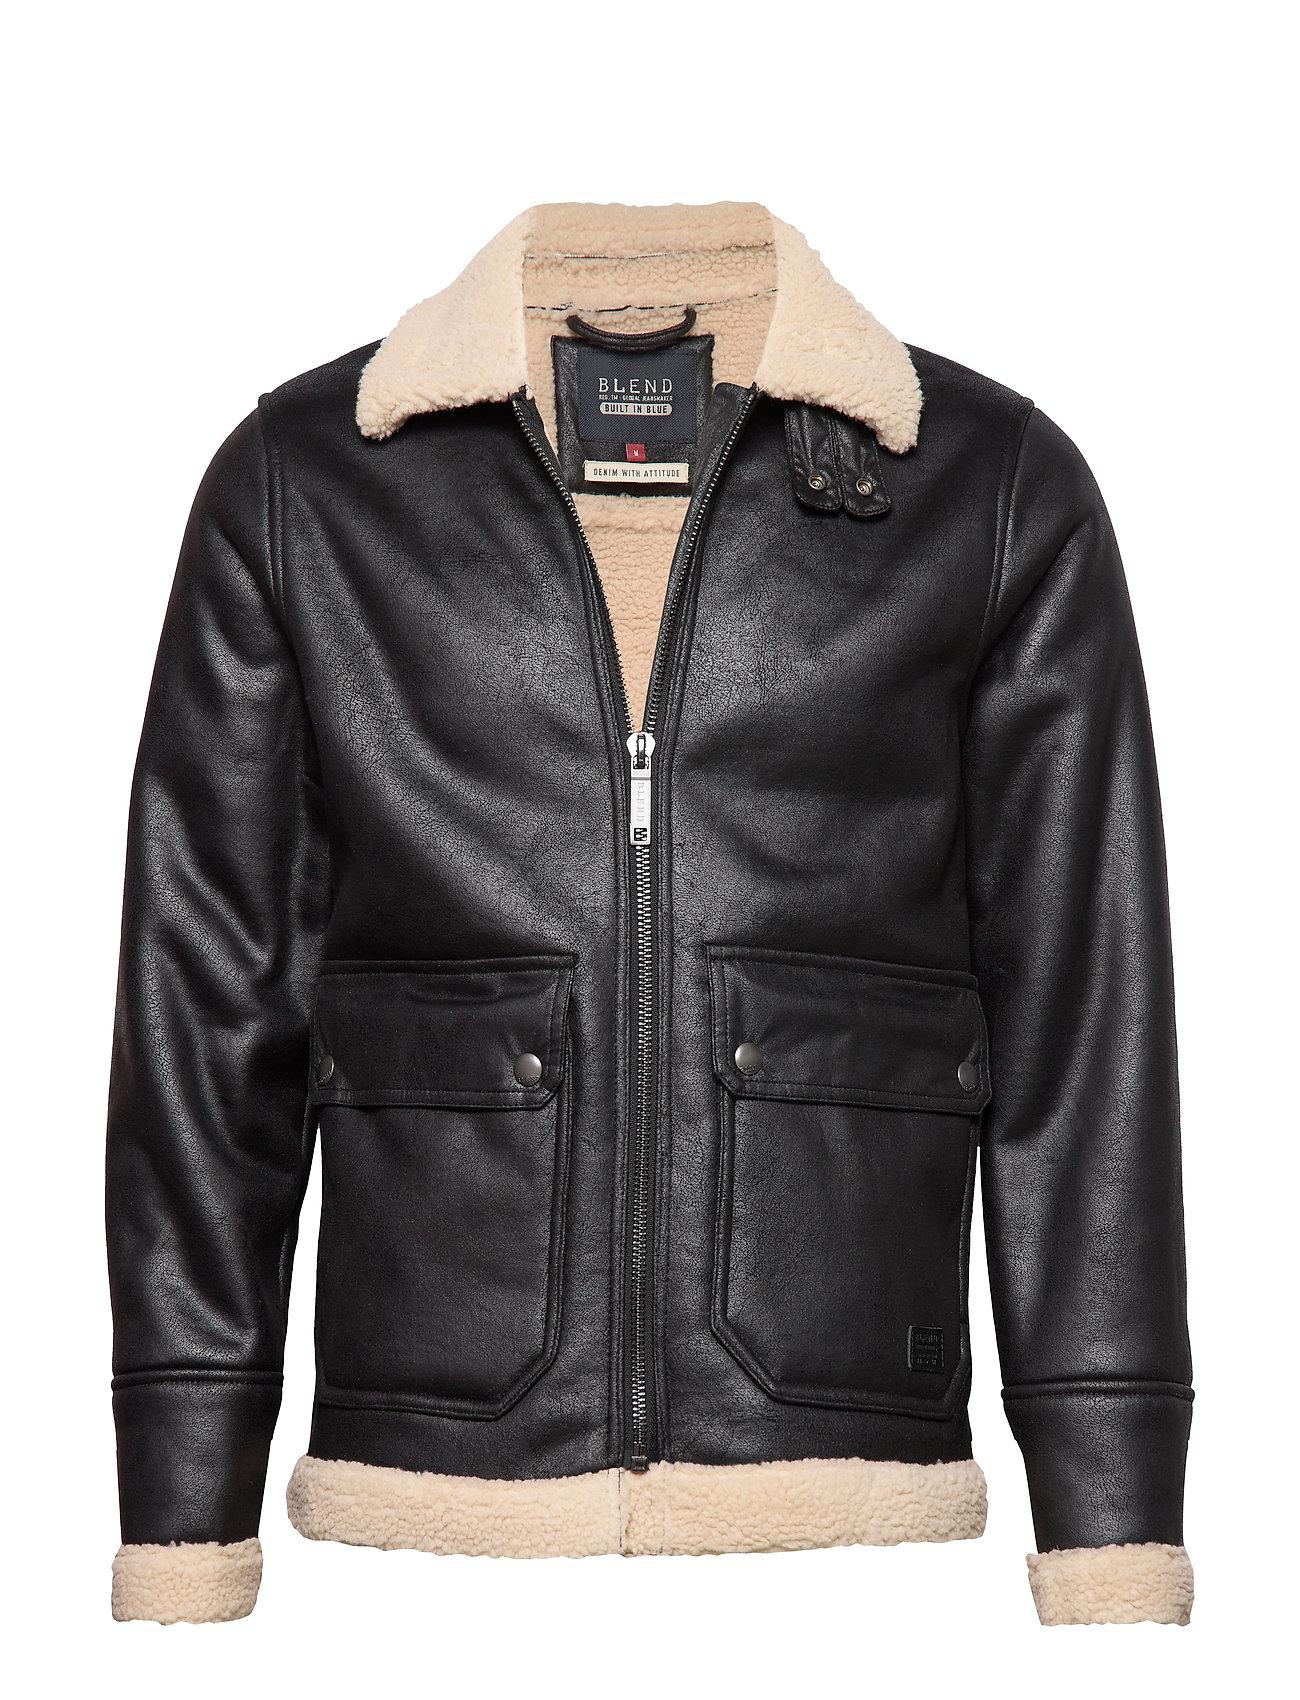 Blend Outerwear - BLACK